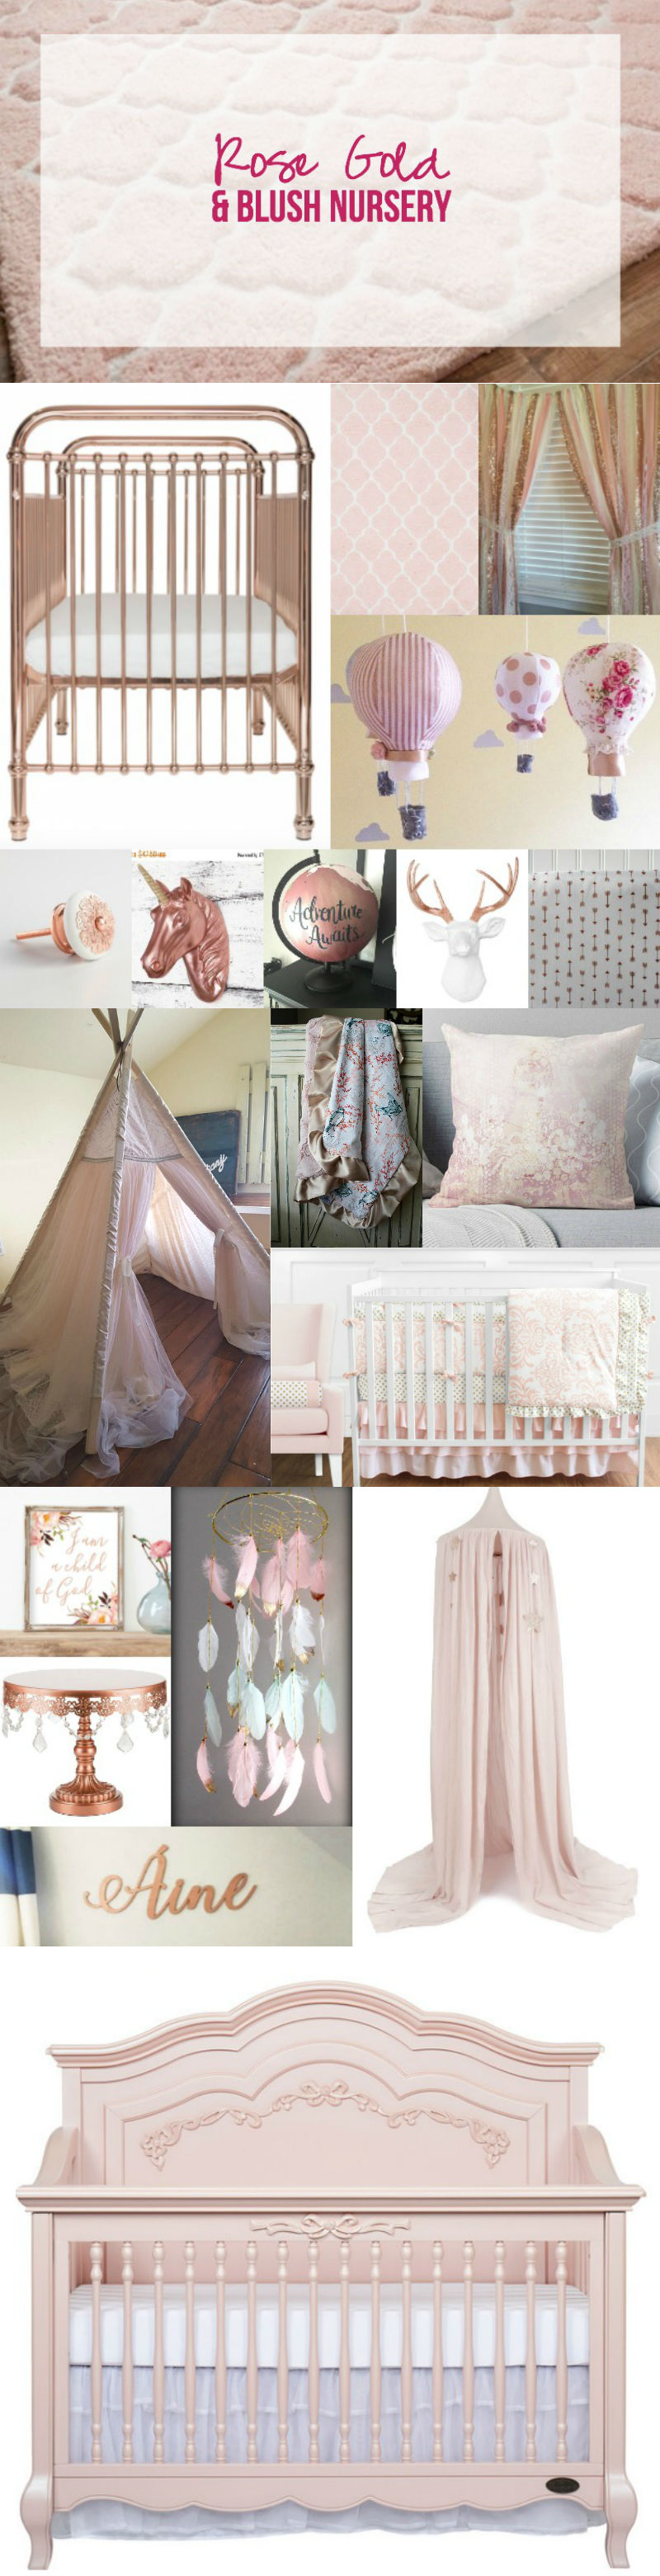 Rose Gold and Blush Nursery